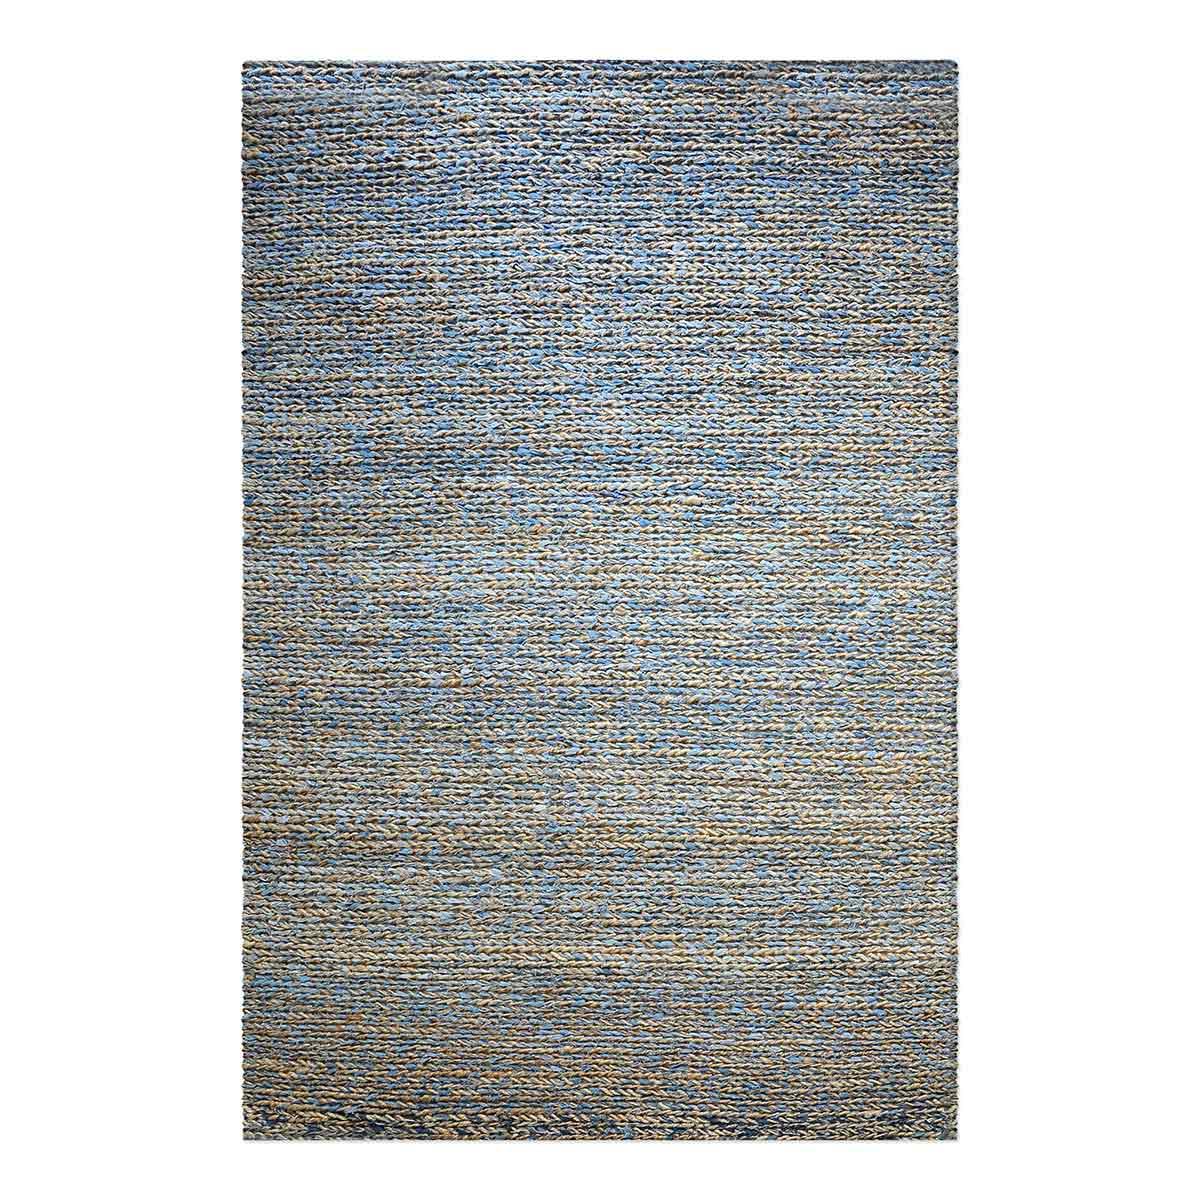 Uttermost Euston 9 x 12 Rug - Natural Blue